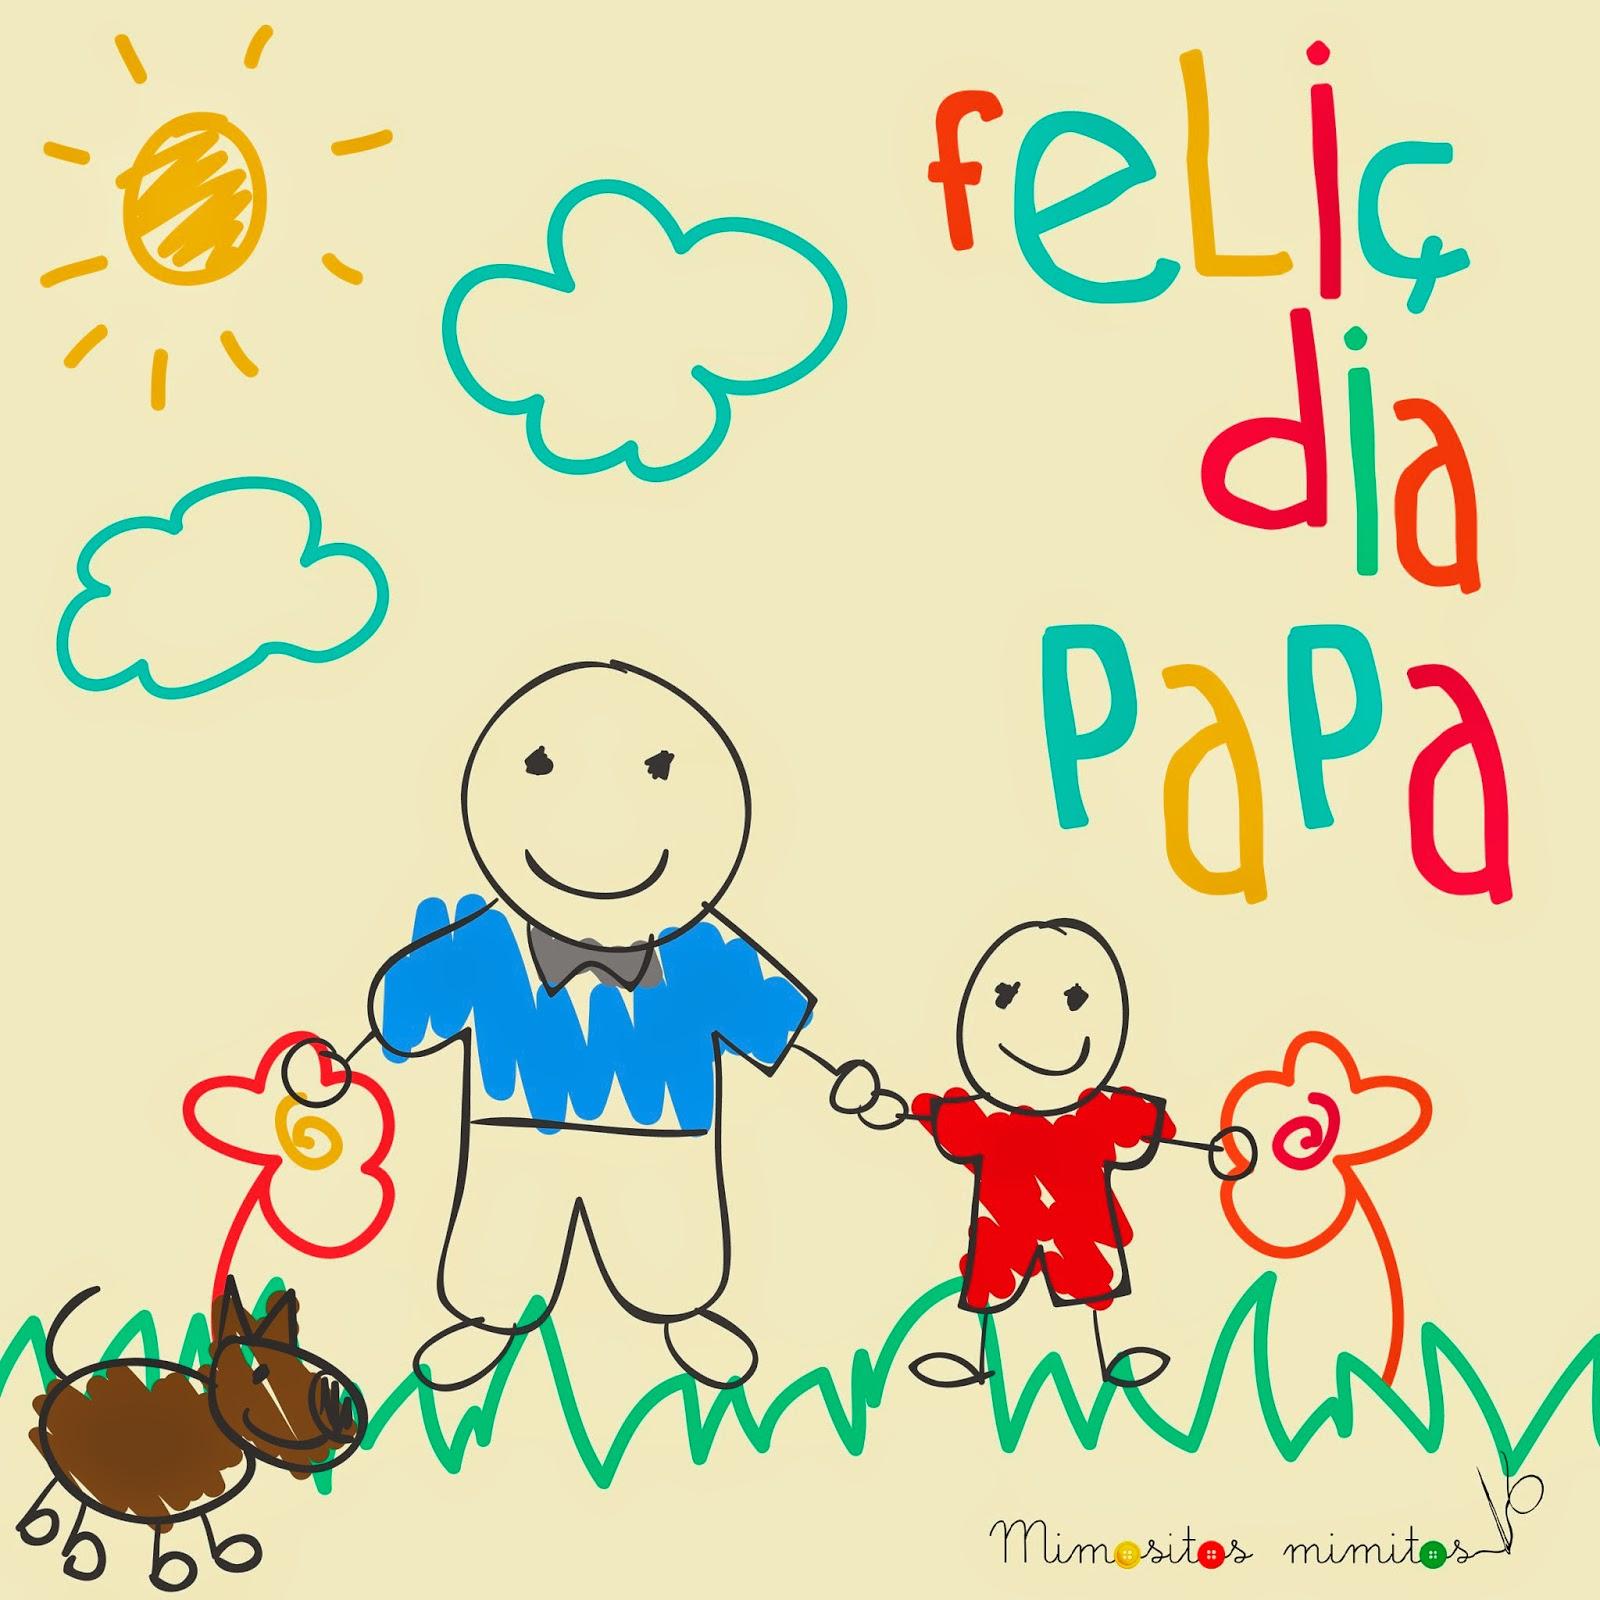 dia del padre father s day dia del pare freebies descargable gratis-català